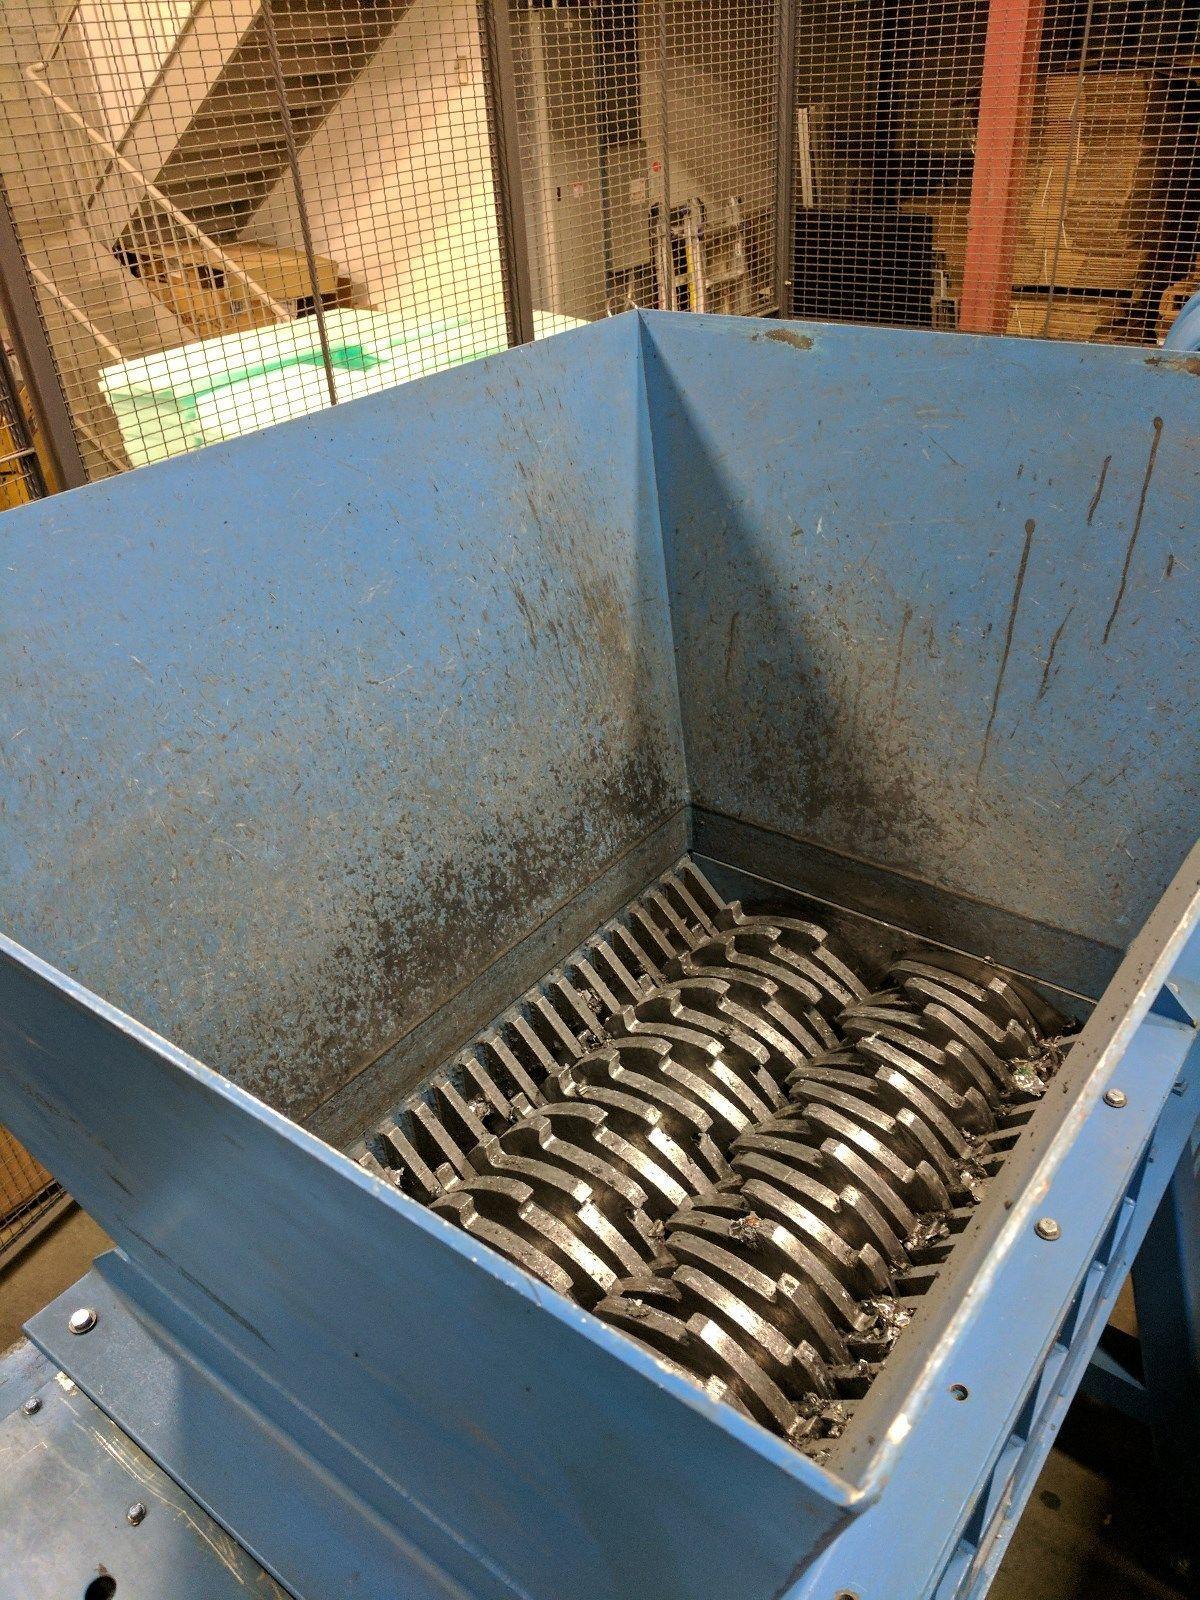 Franklin Miller Taskmaster Tm2842 Industrial Shredder Shredder Machine Shredder Recycling Machines